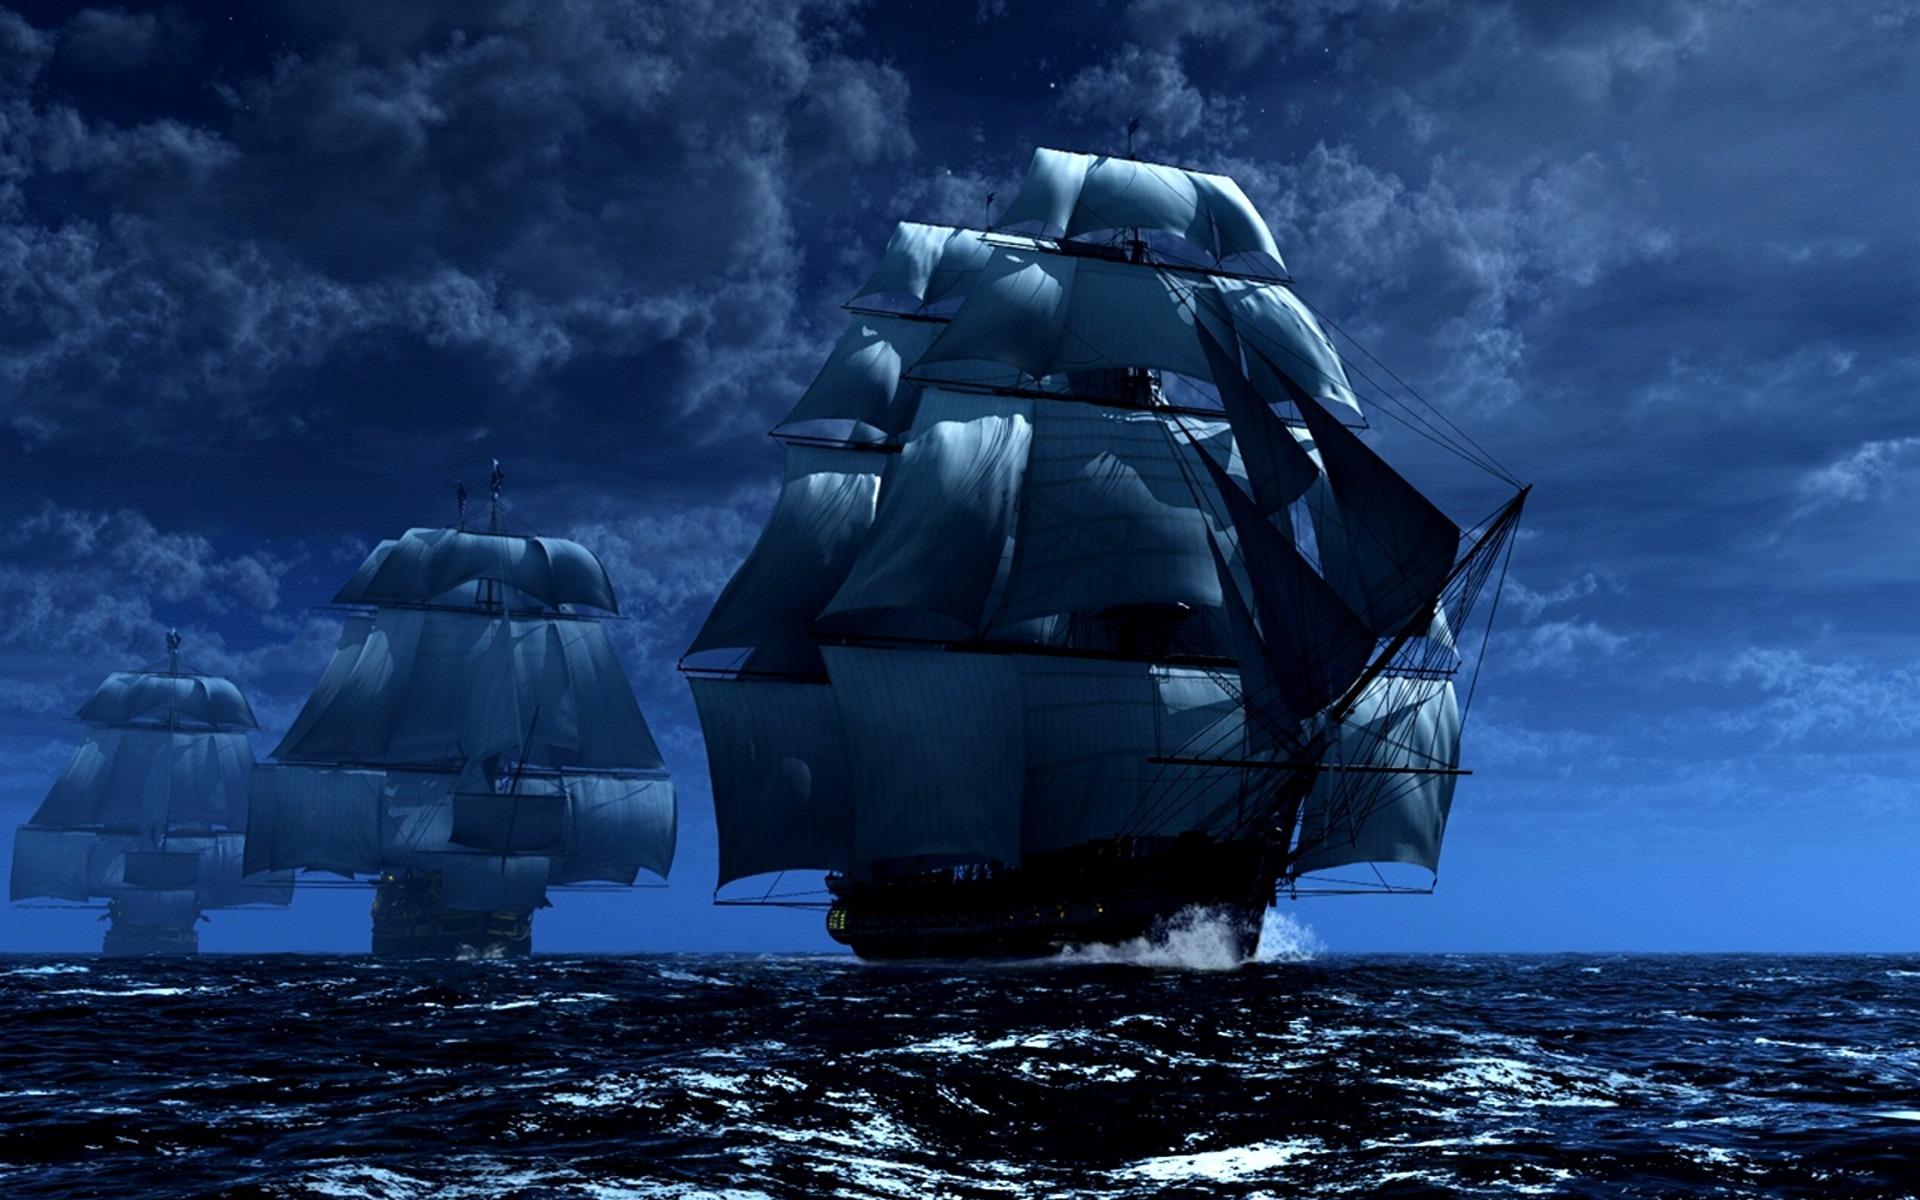 Ships The sailing ships 027695 jpg 1920x1200